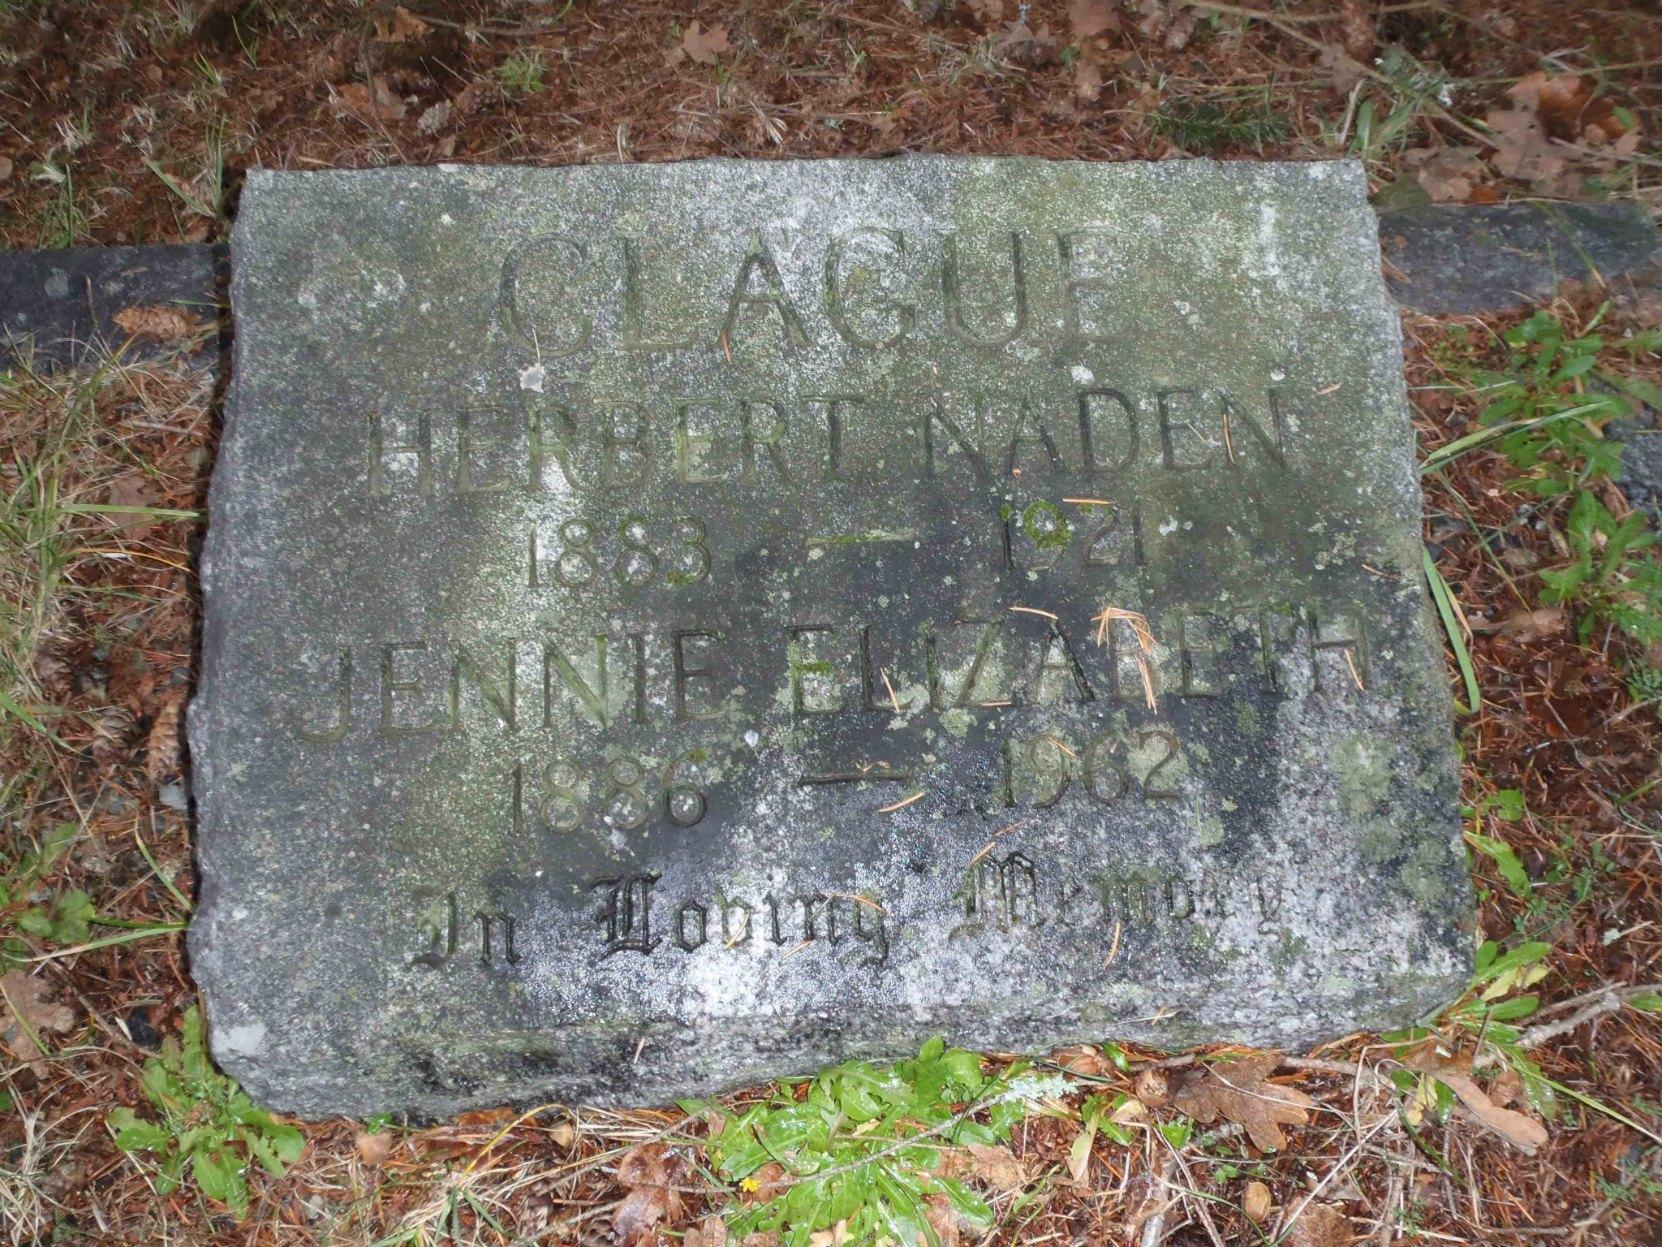 Herbert Naden Clague grave marker, St. Peter's Quamichan cemetery, Duncan, B.C.